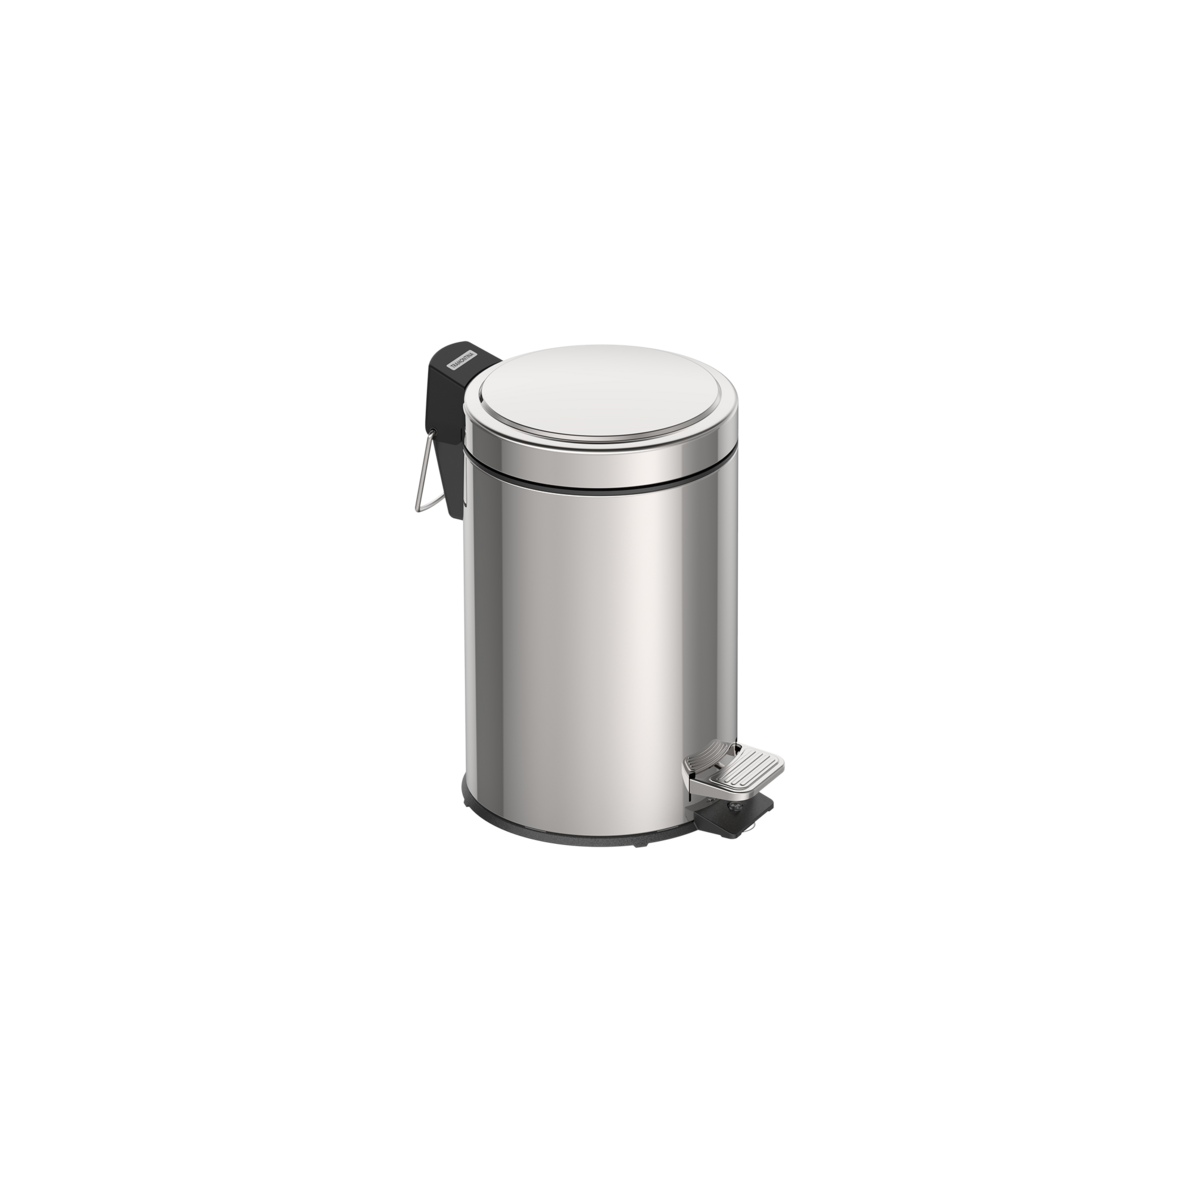 Lixeira Tramontina Inox com Pedal 94538/103 3LT